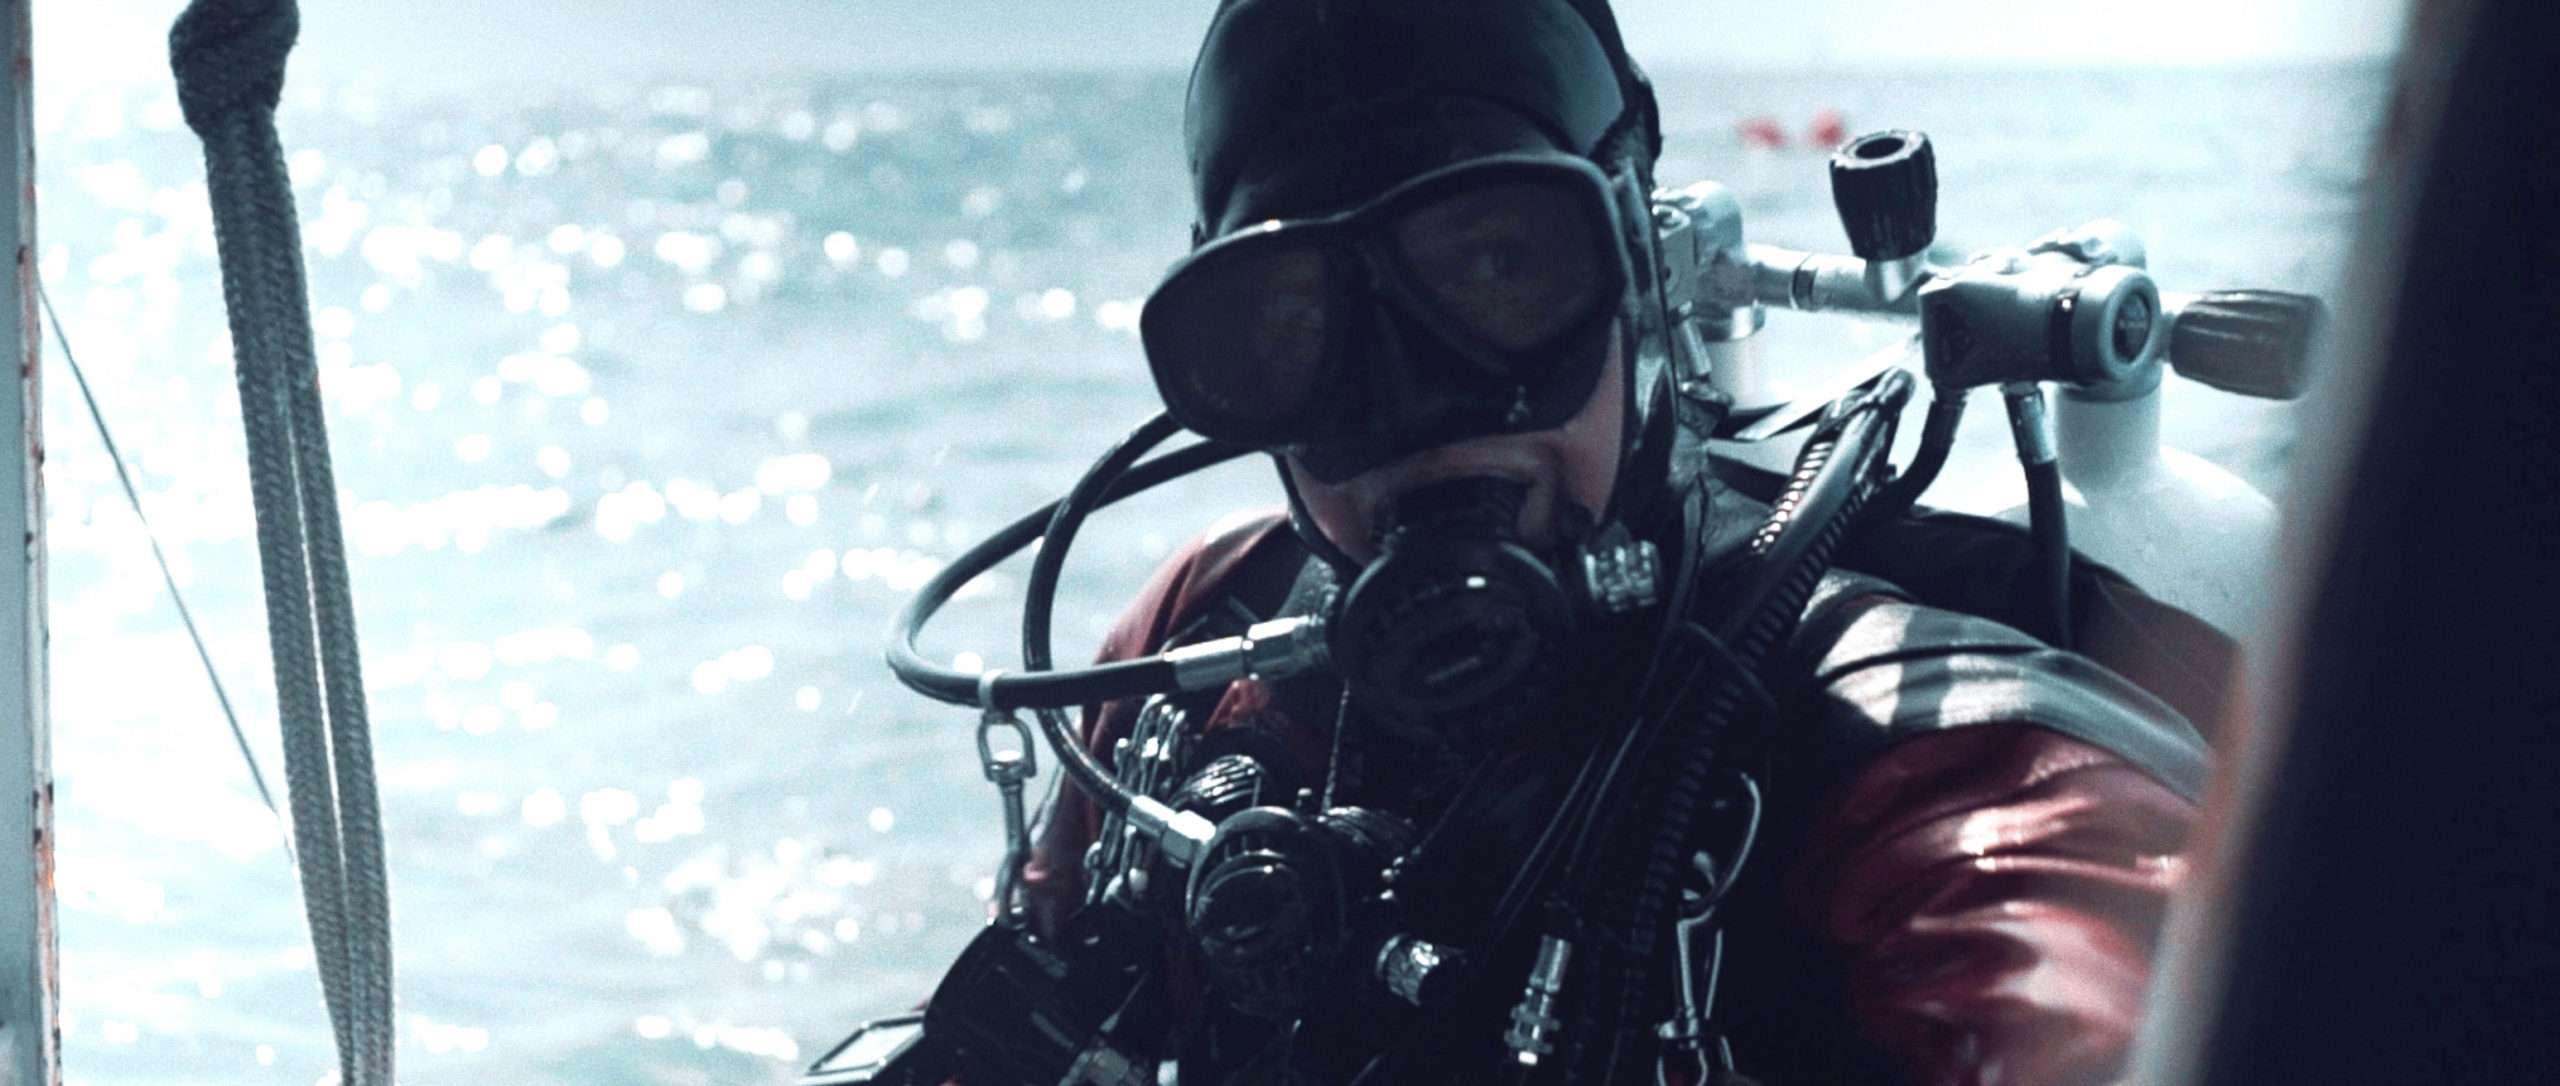 bracenet ghost diving